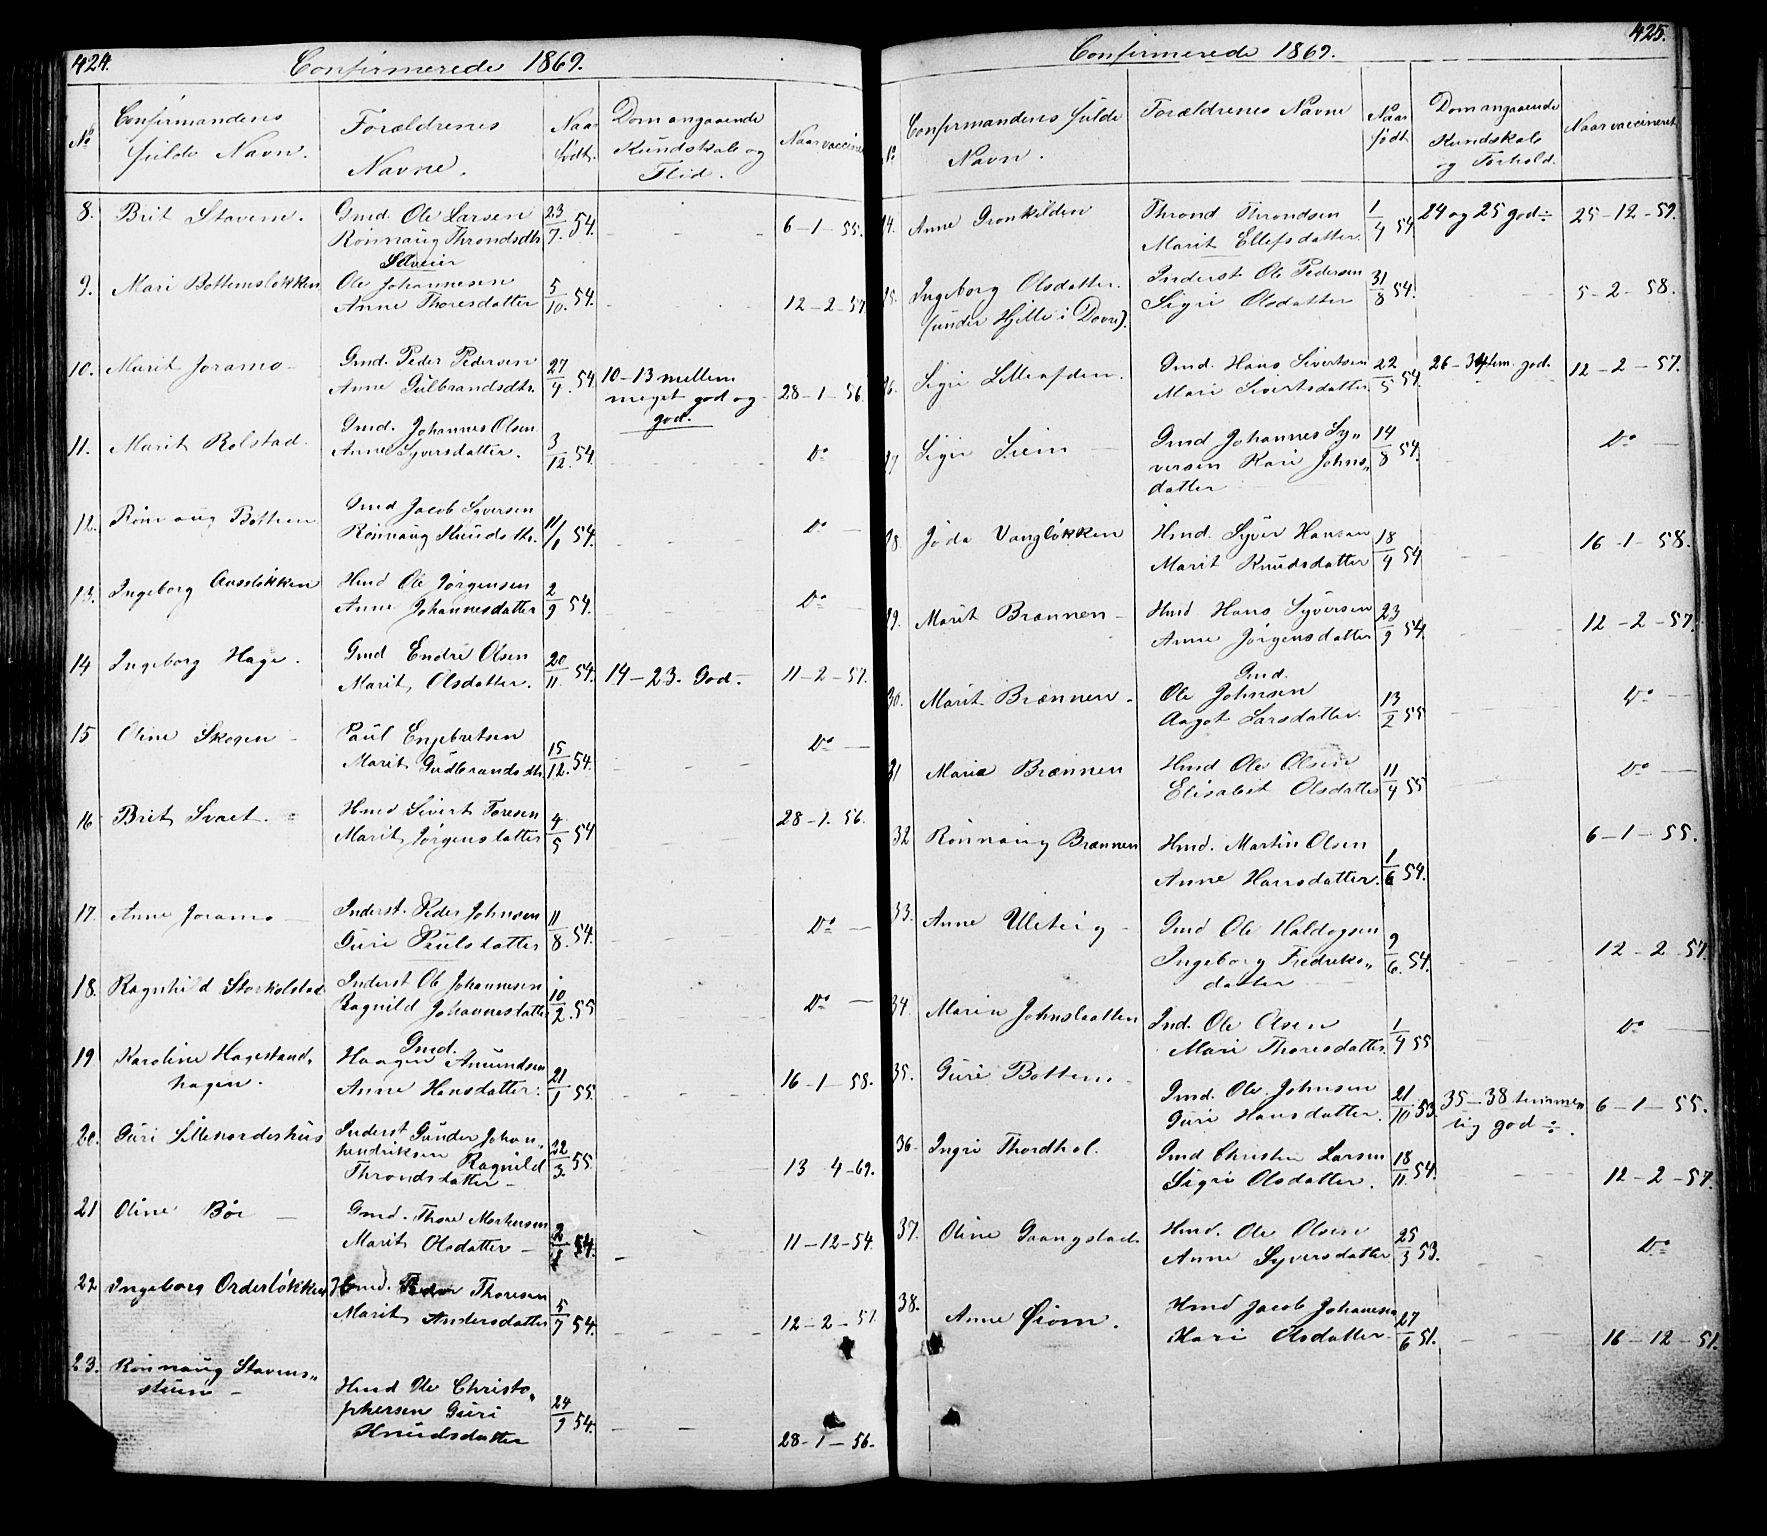 SAH, Lesja prestekontor, Klokkerbok nr. 5, 1850-1894, s. 424-425